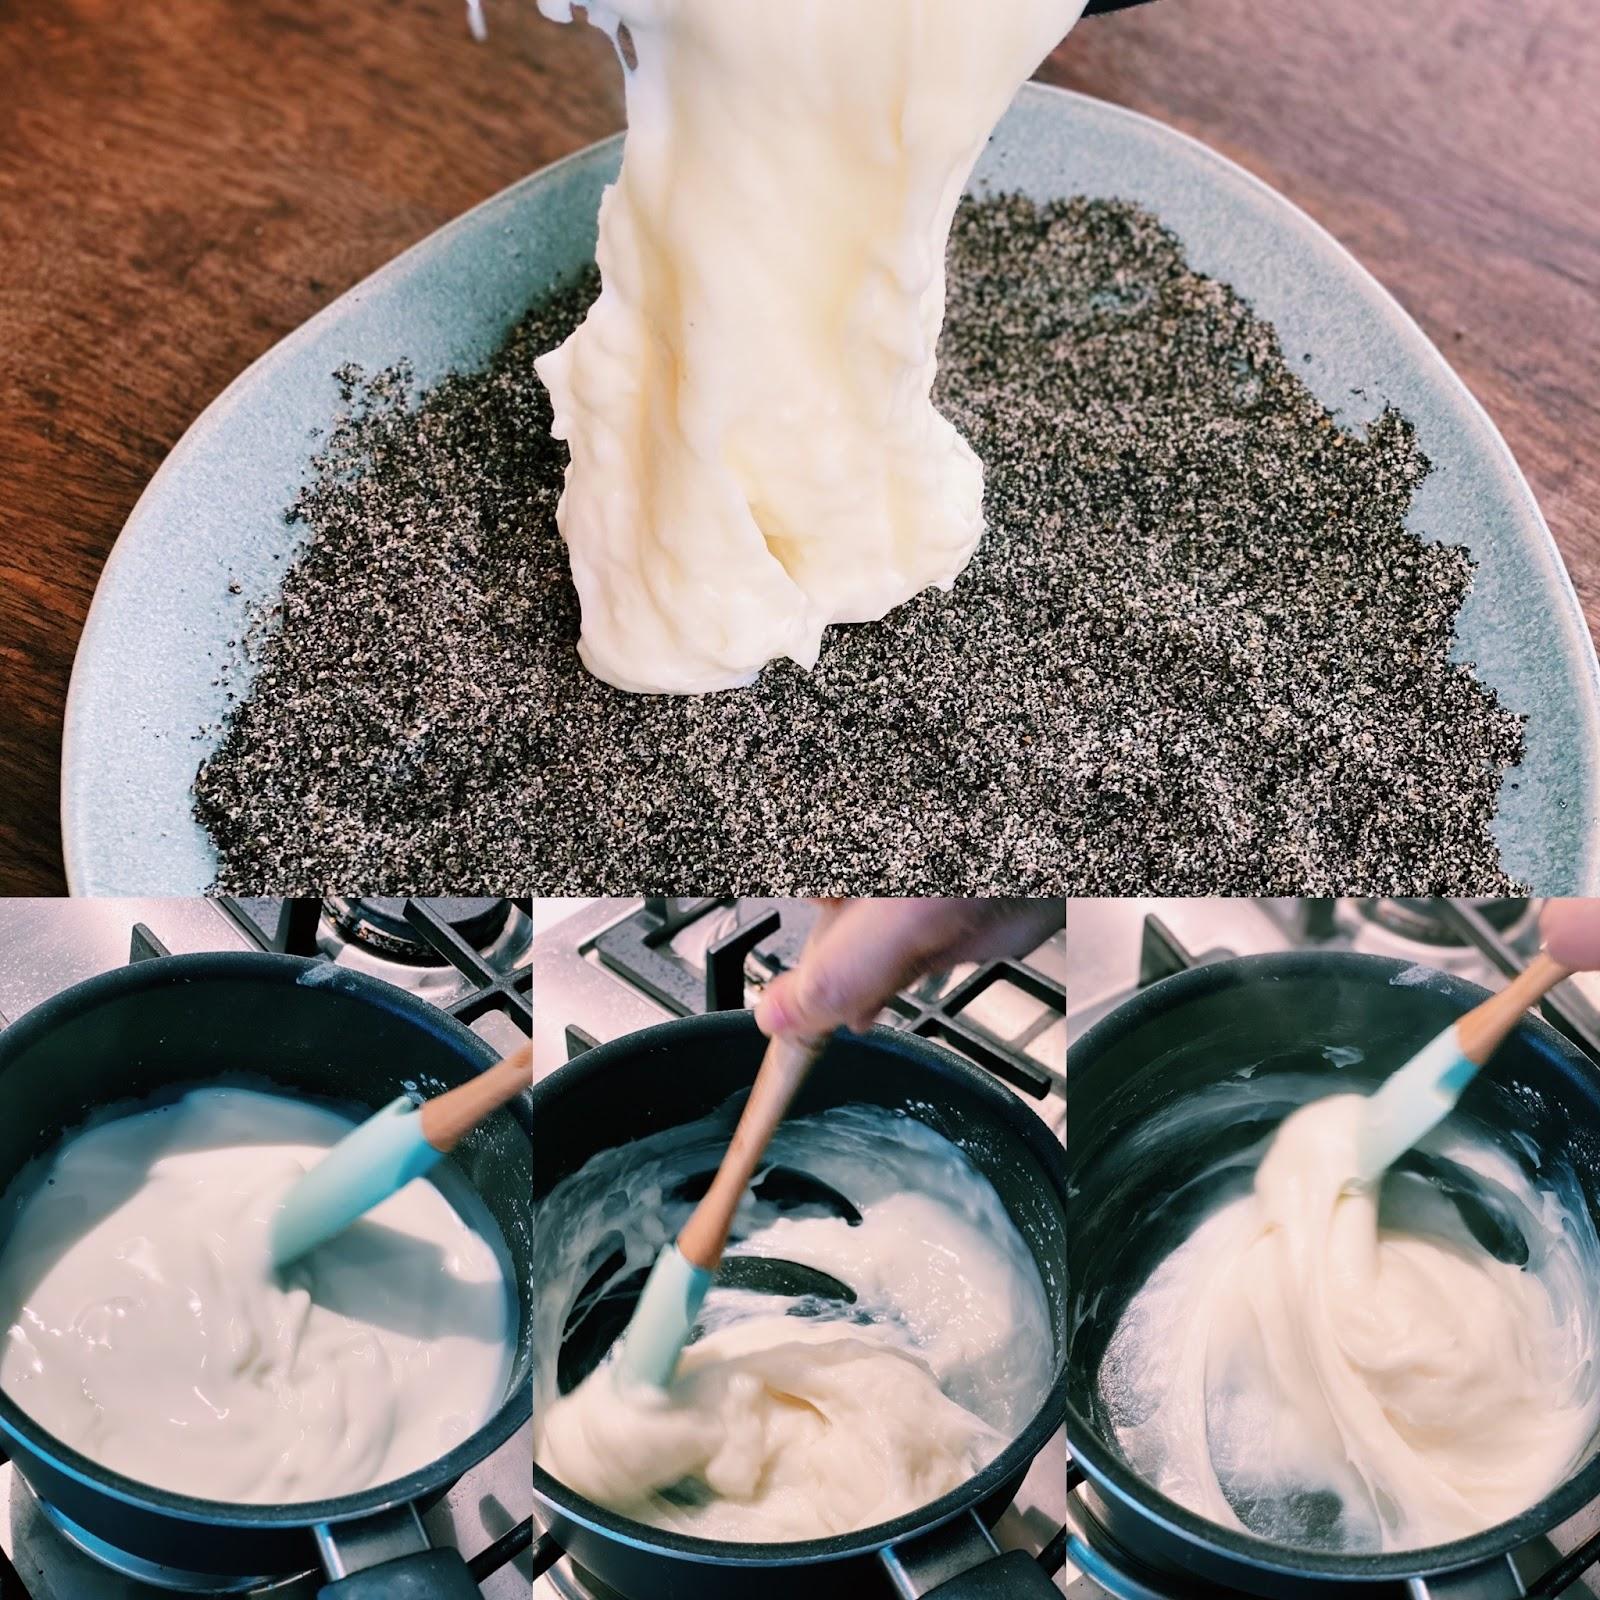 How to make Taiwanese mochi at home